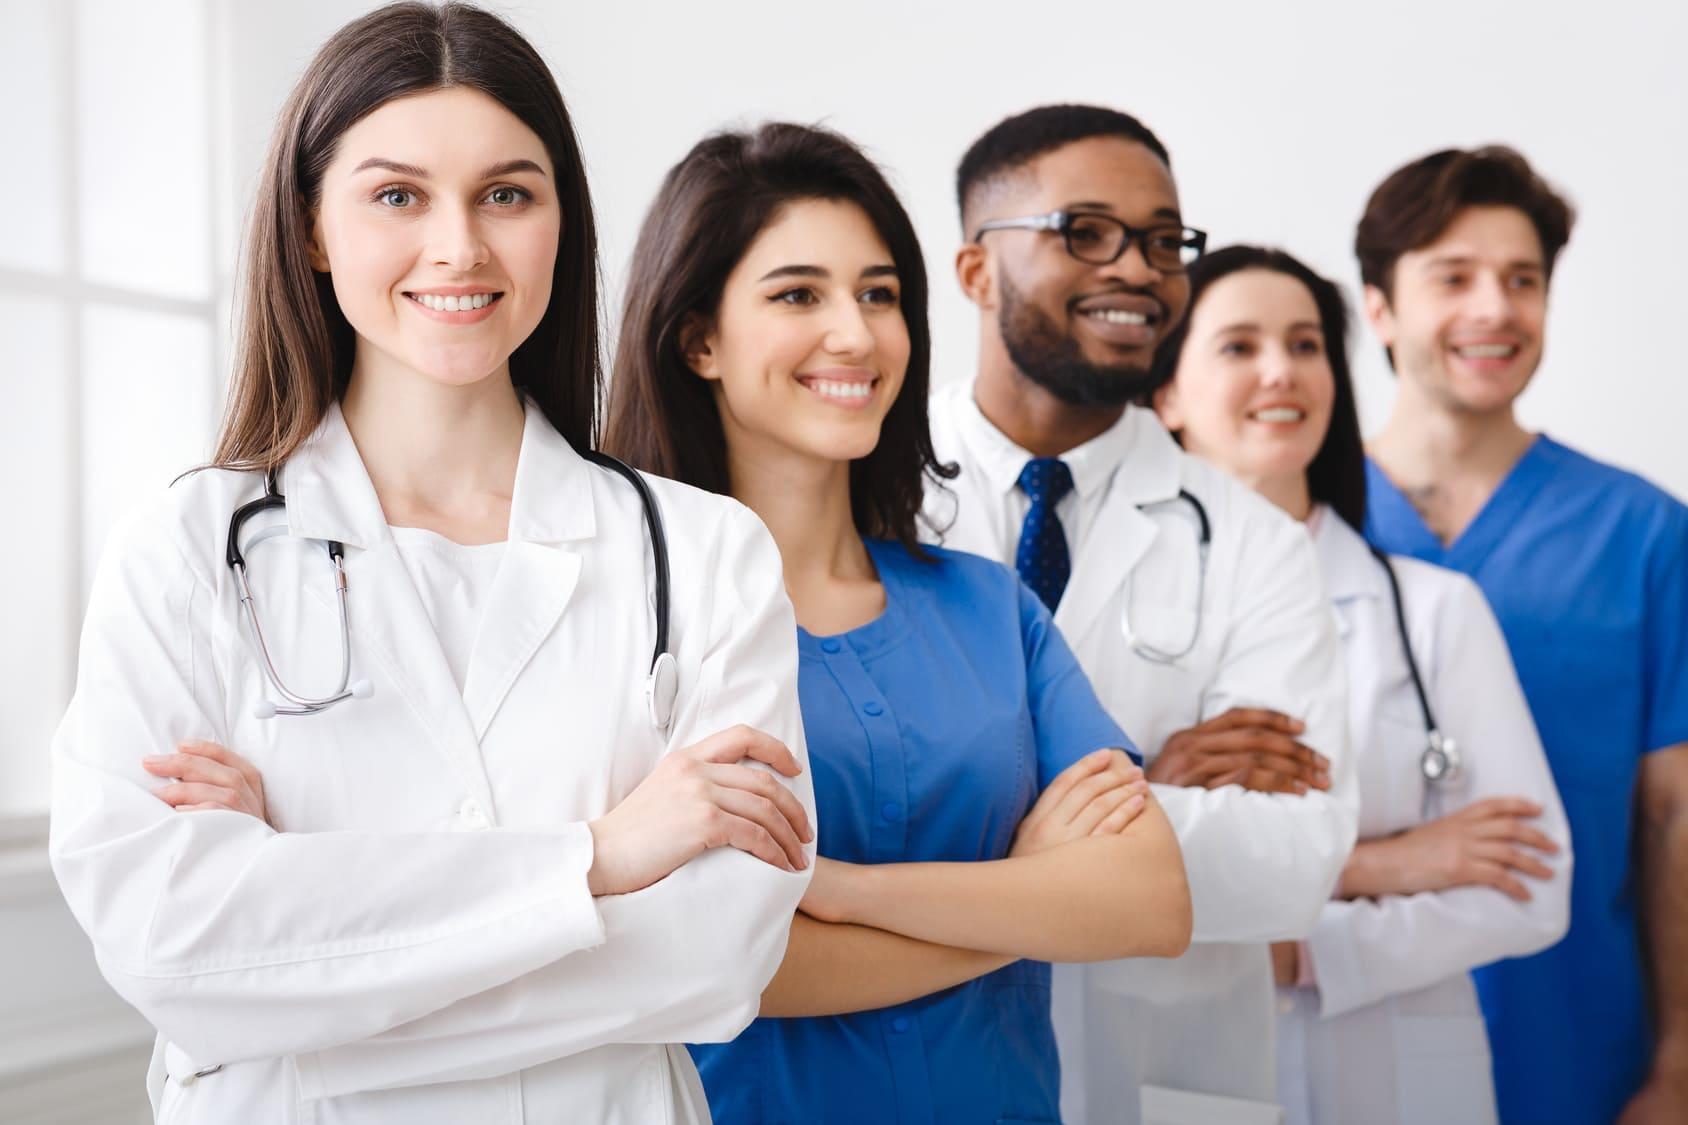 Vestibulares de Enfermagem 2021